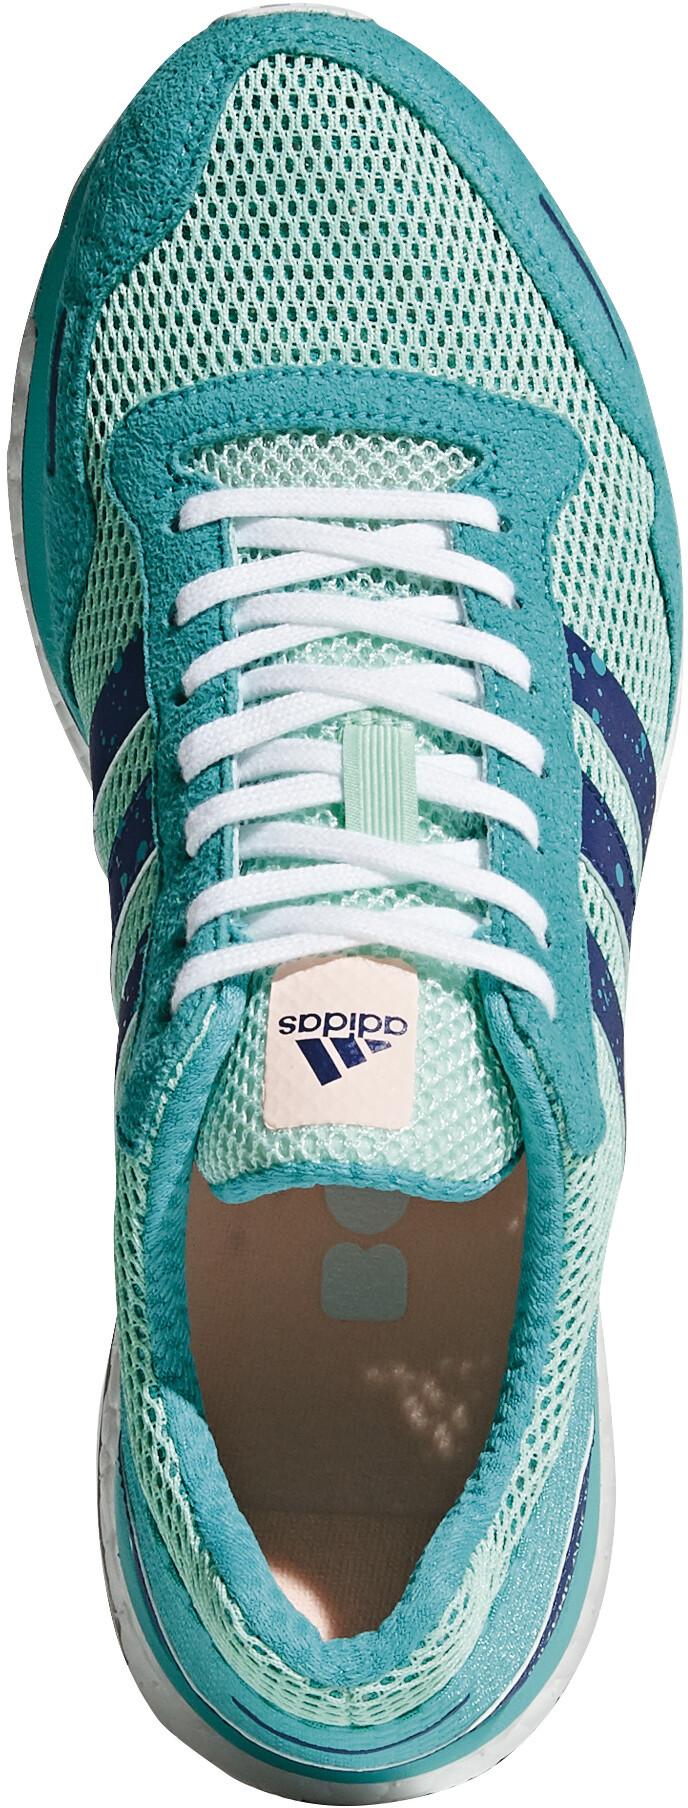 d95f9b523 adidas Adizero Adios 3 Running Shoes Women turquoise at Bikester.co.uk